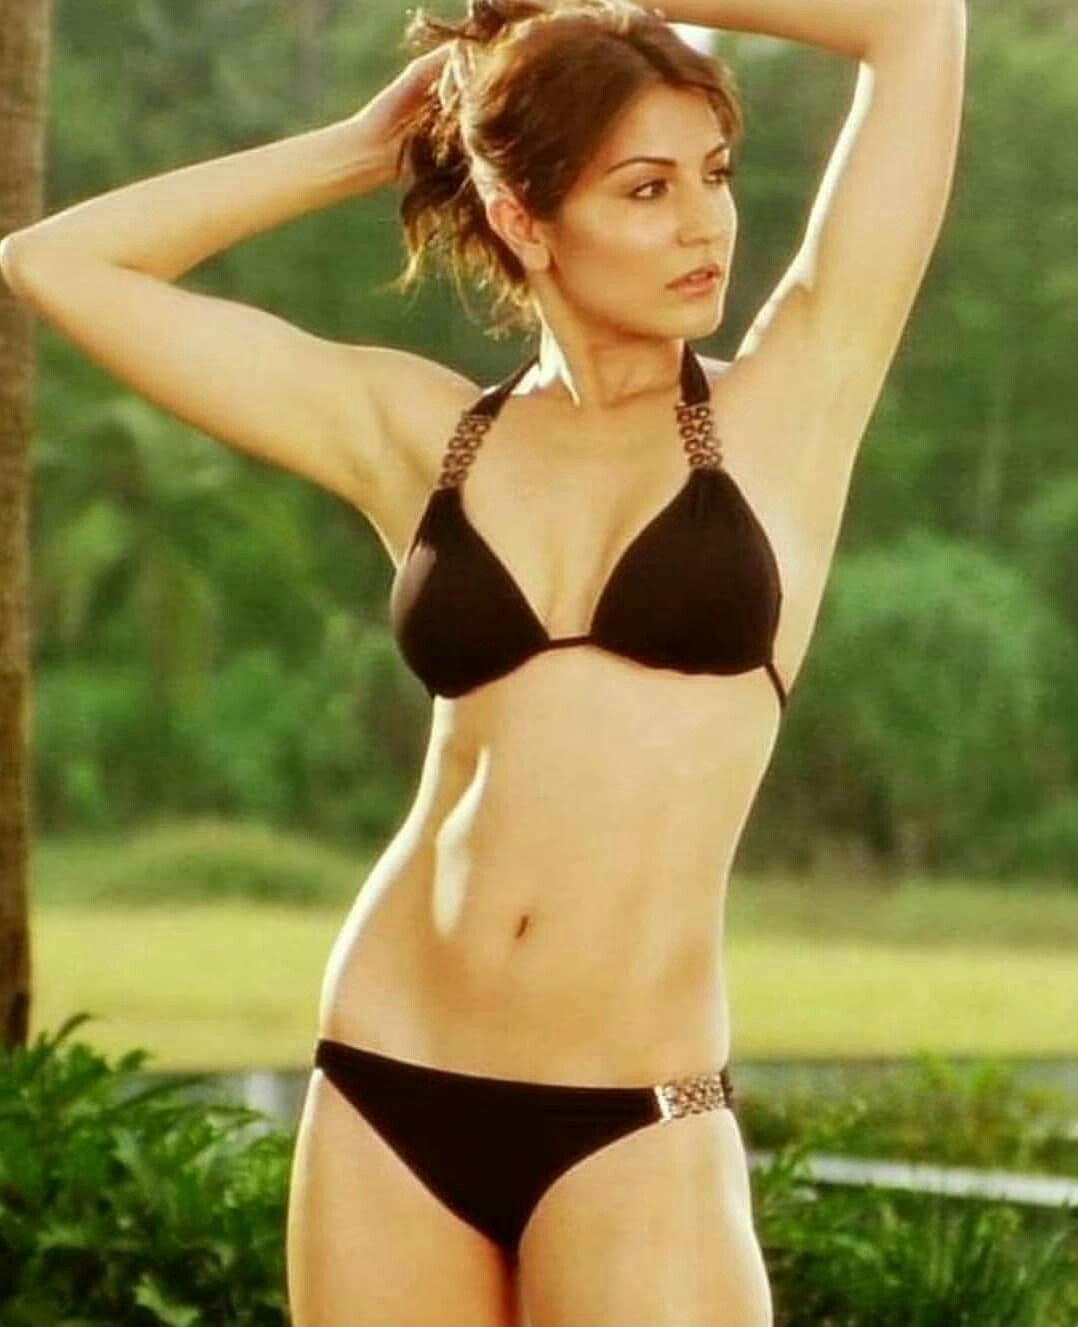 Anushka-sharma-in-bikini-showing-her-hot-toned-body